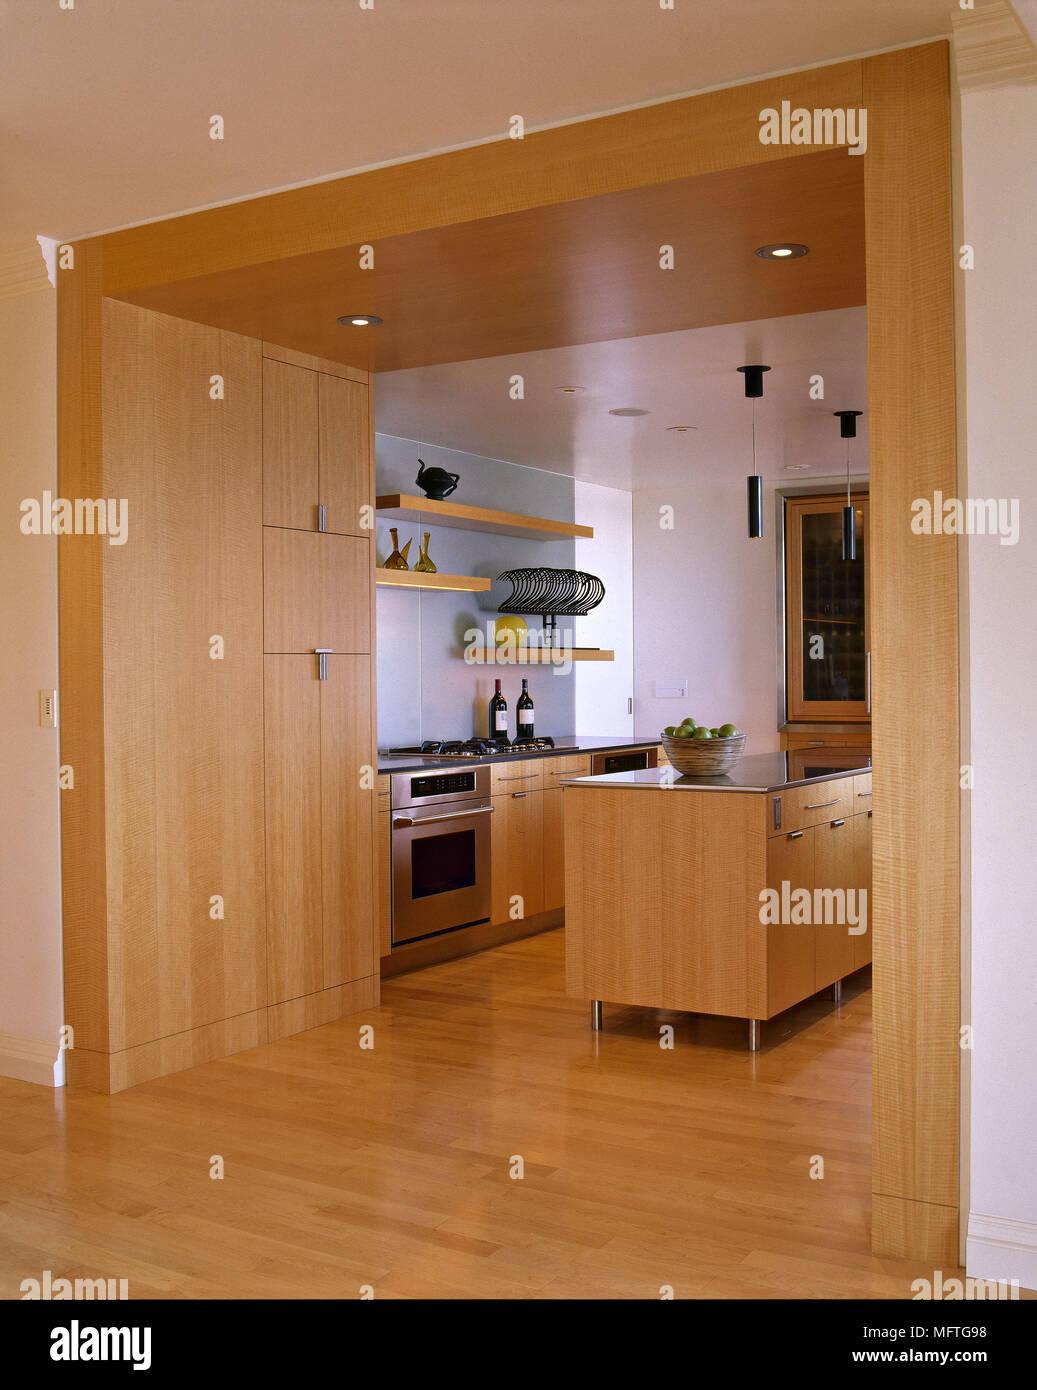 moderne k che holz units central island einheit offene t r holz boden interieur k chen stockfoto. Black Bedroom Furniture Sets. Home Design Ideas